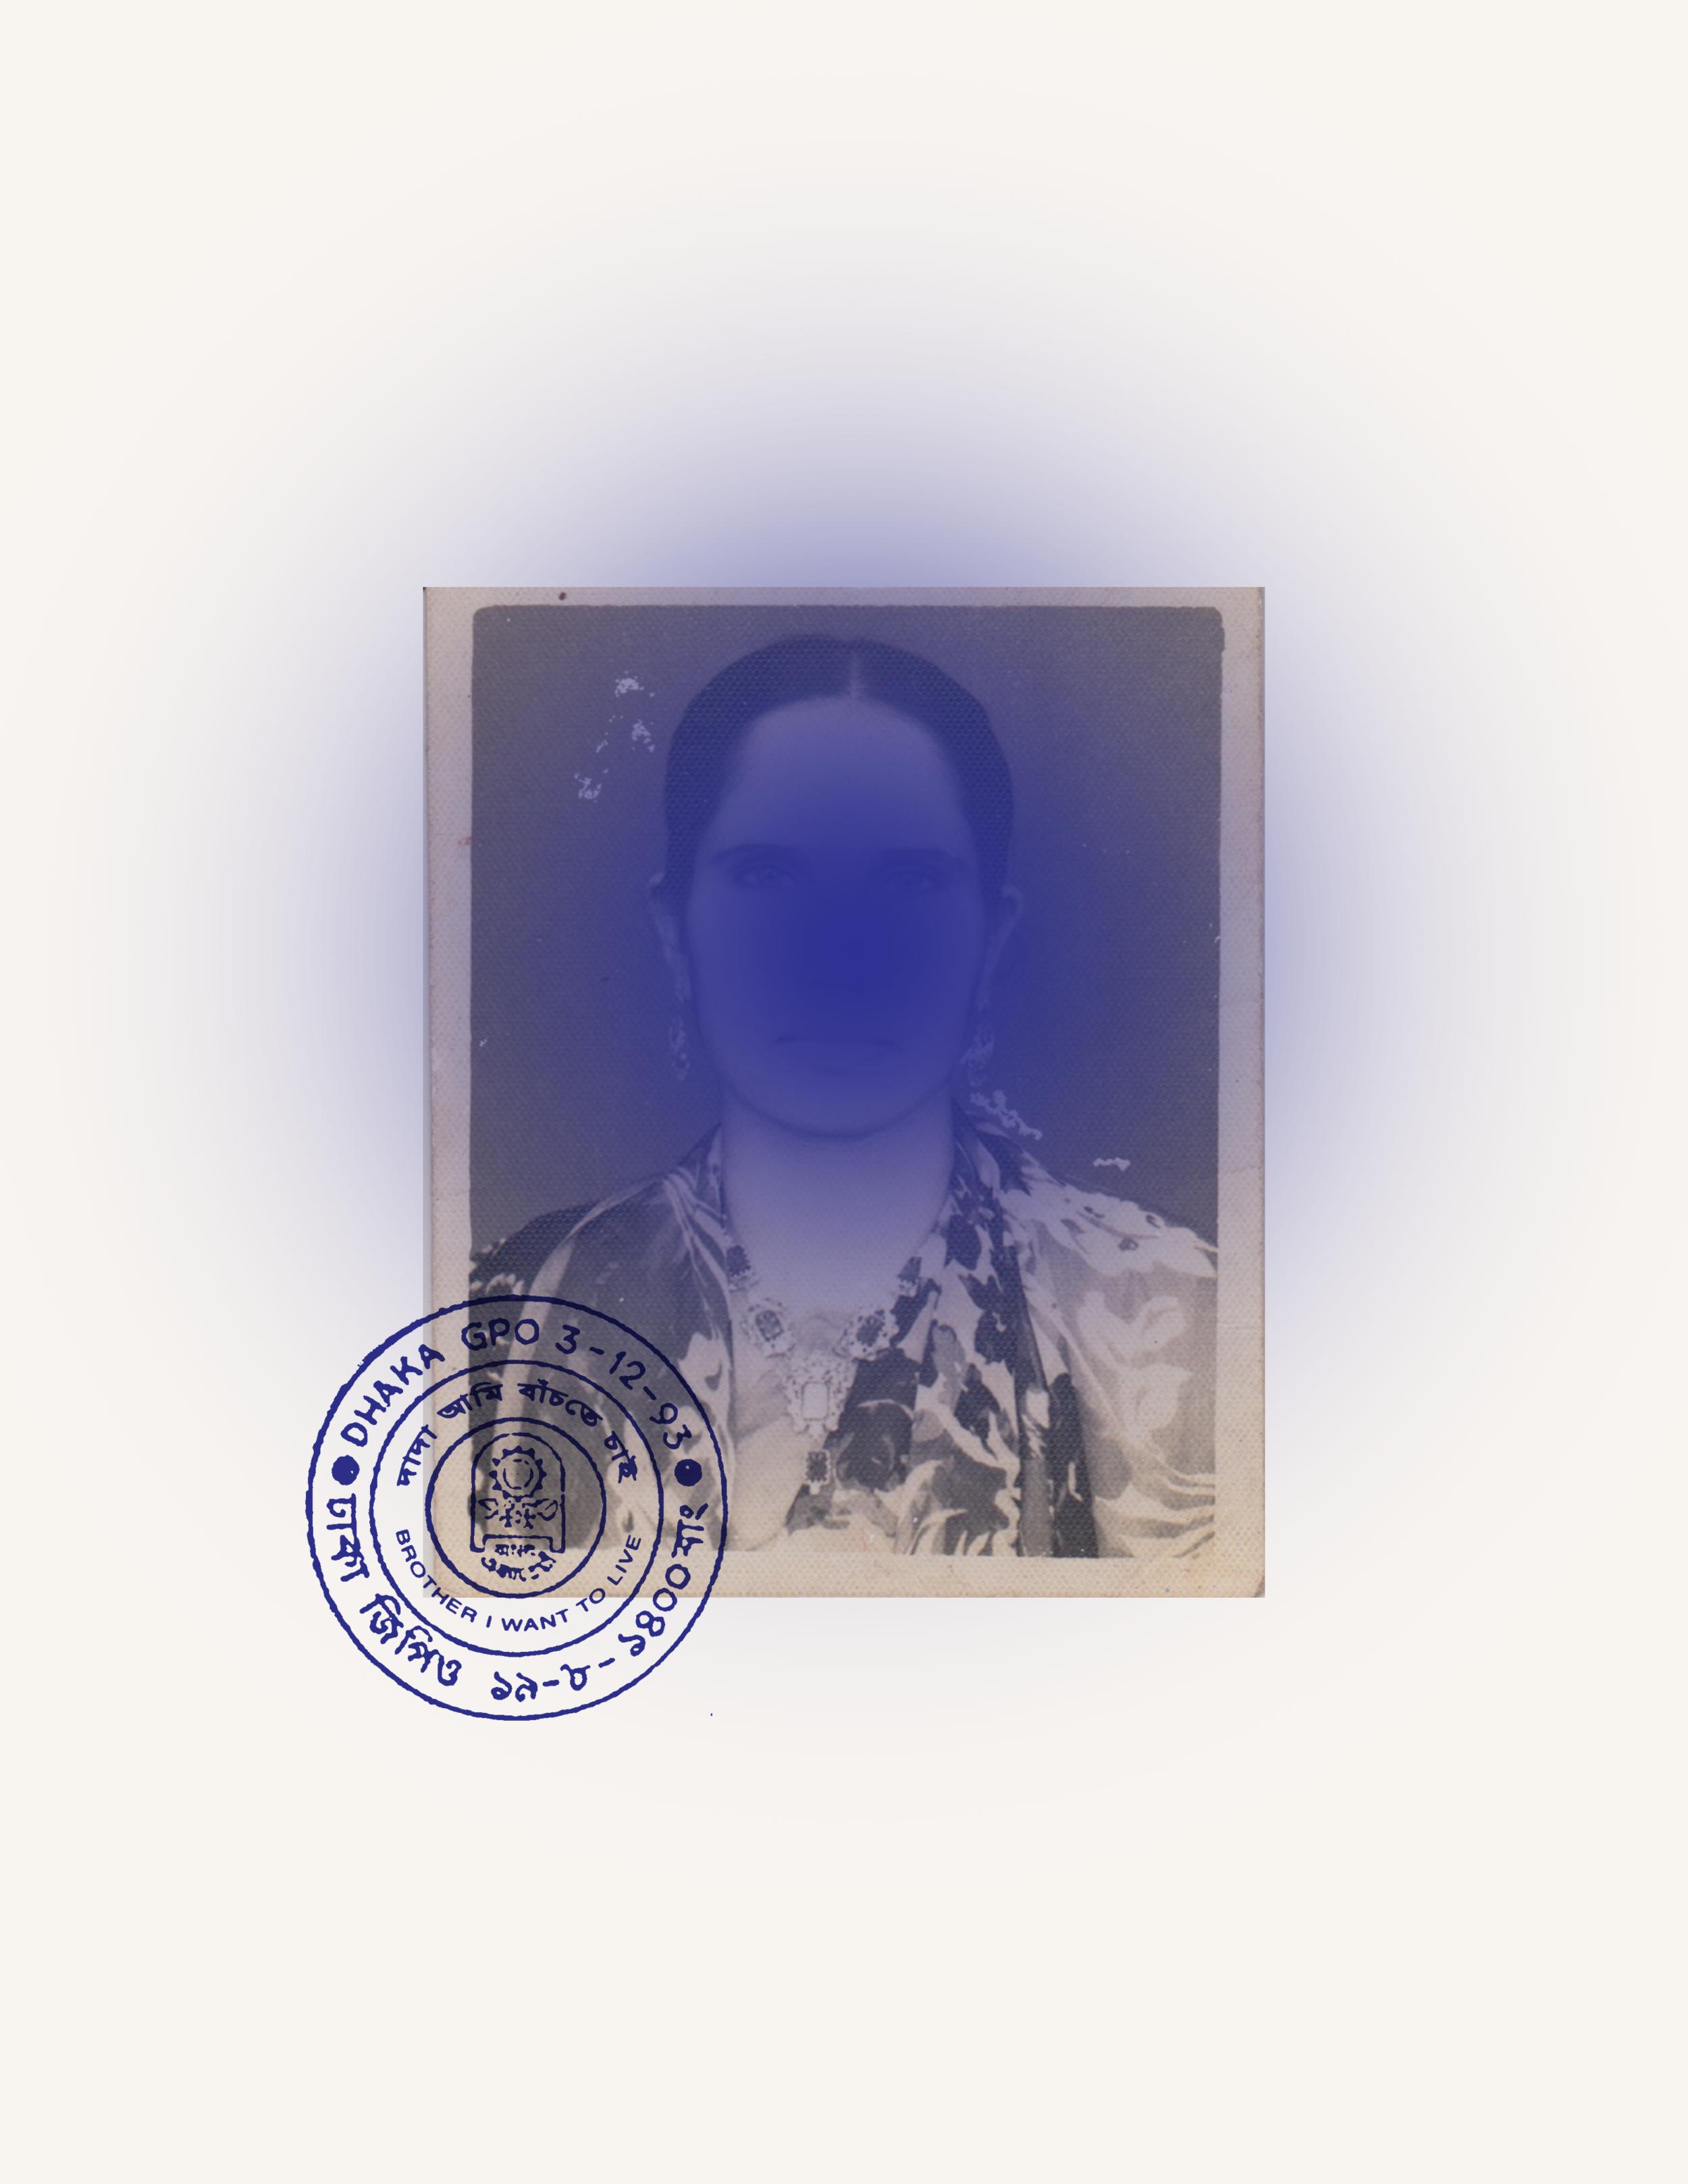 Visa, Mahdi Chowdhury (2019)